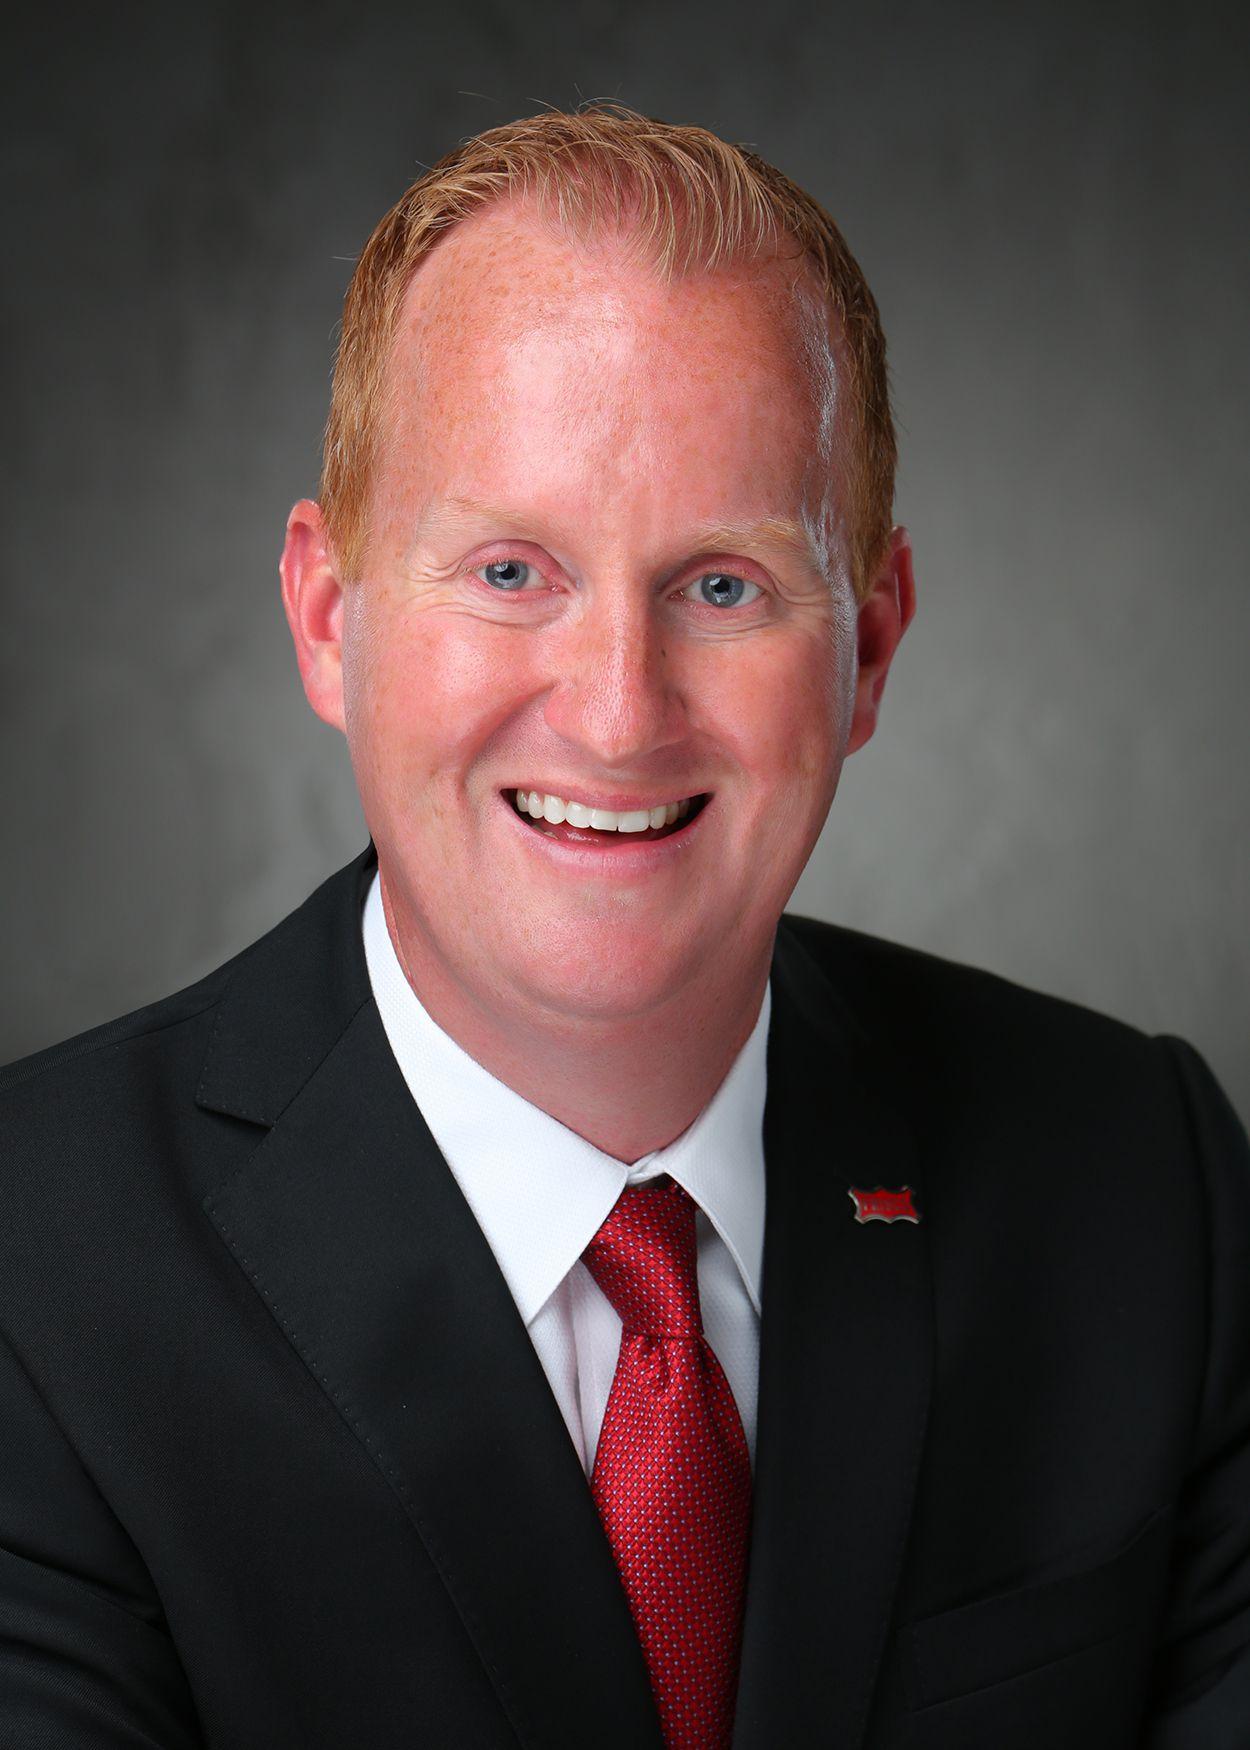 Jeff Cheney is the Frisco mayor.